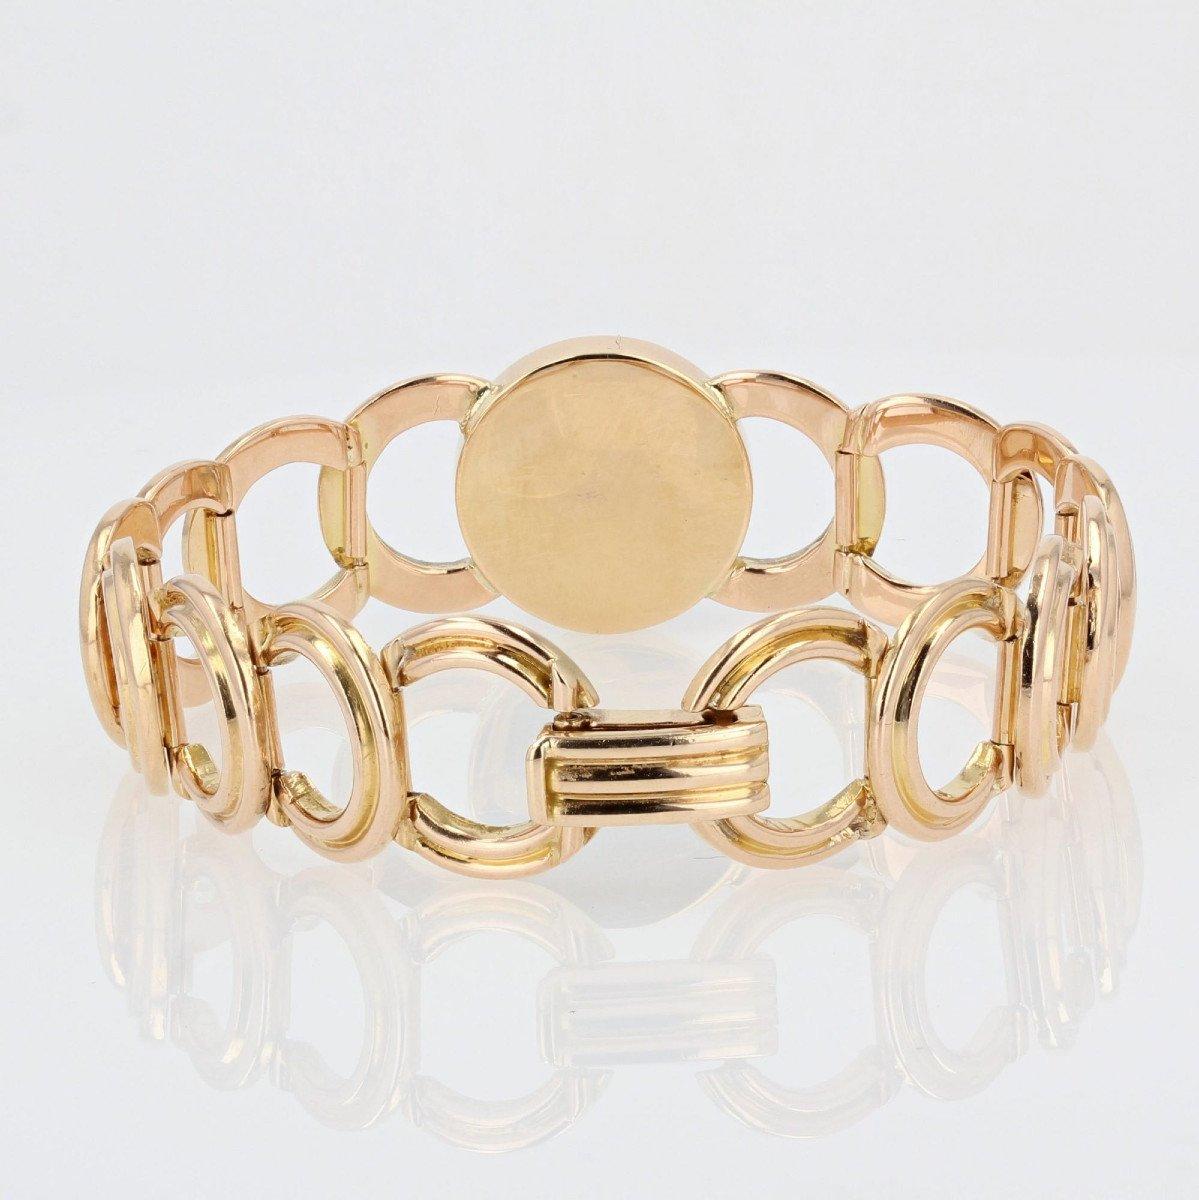 Gold Bracelet With Diamonds And Its Lapis Lazuli Cabochon-photo-6